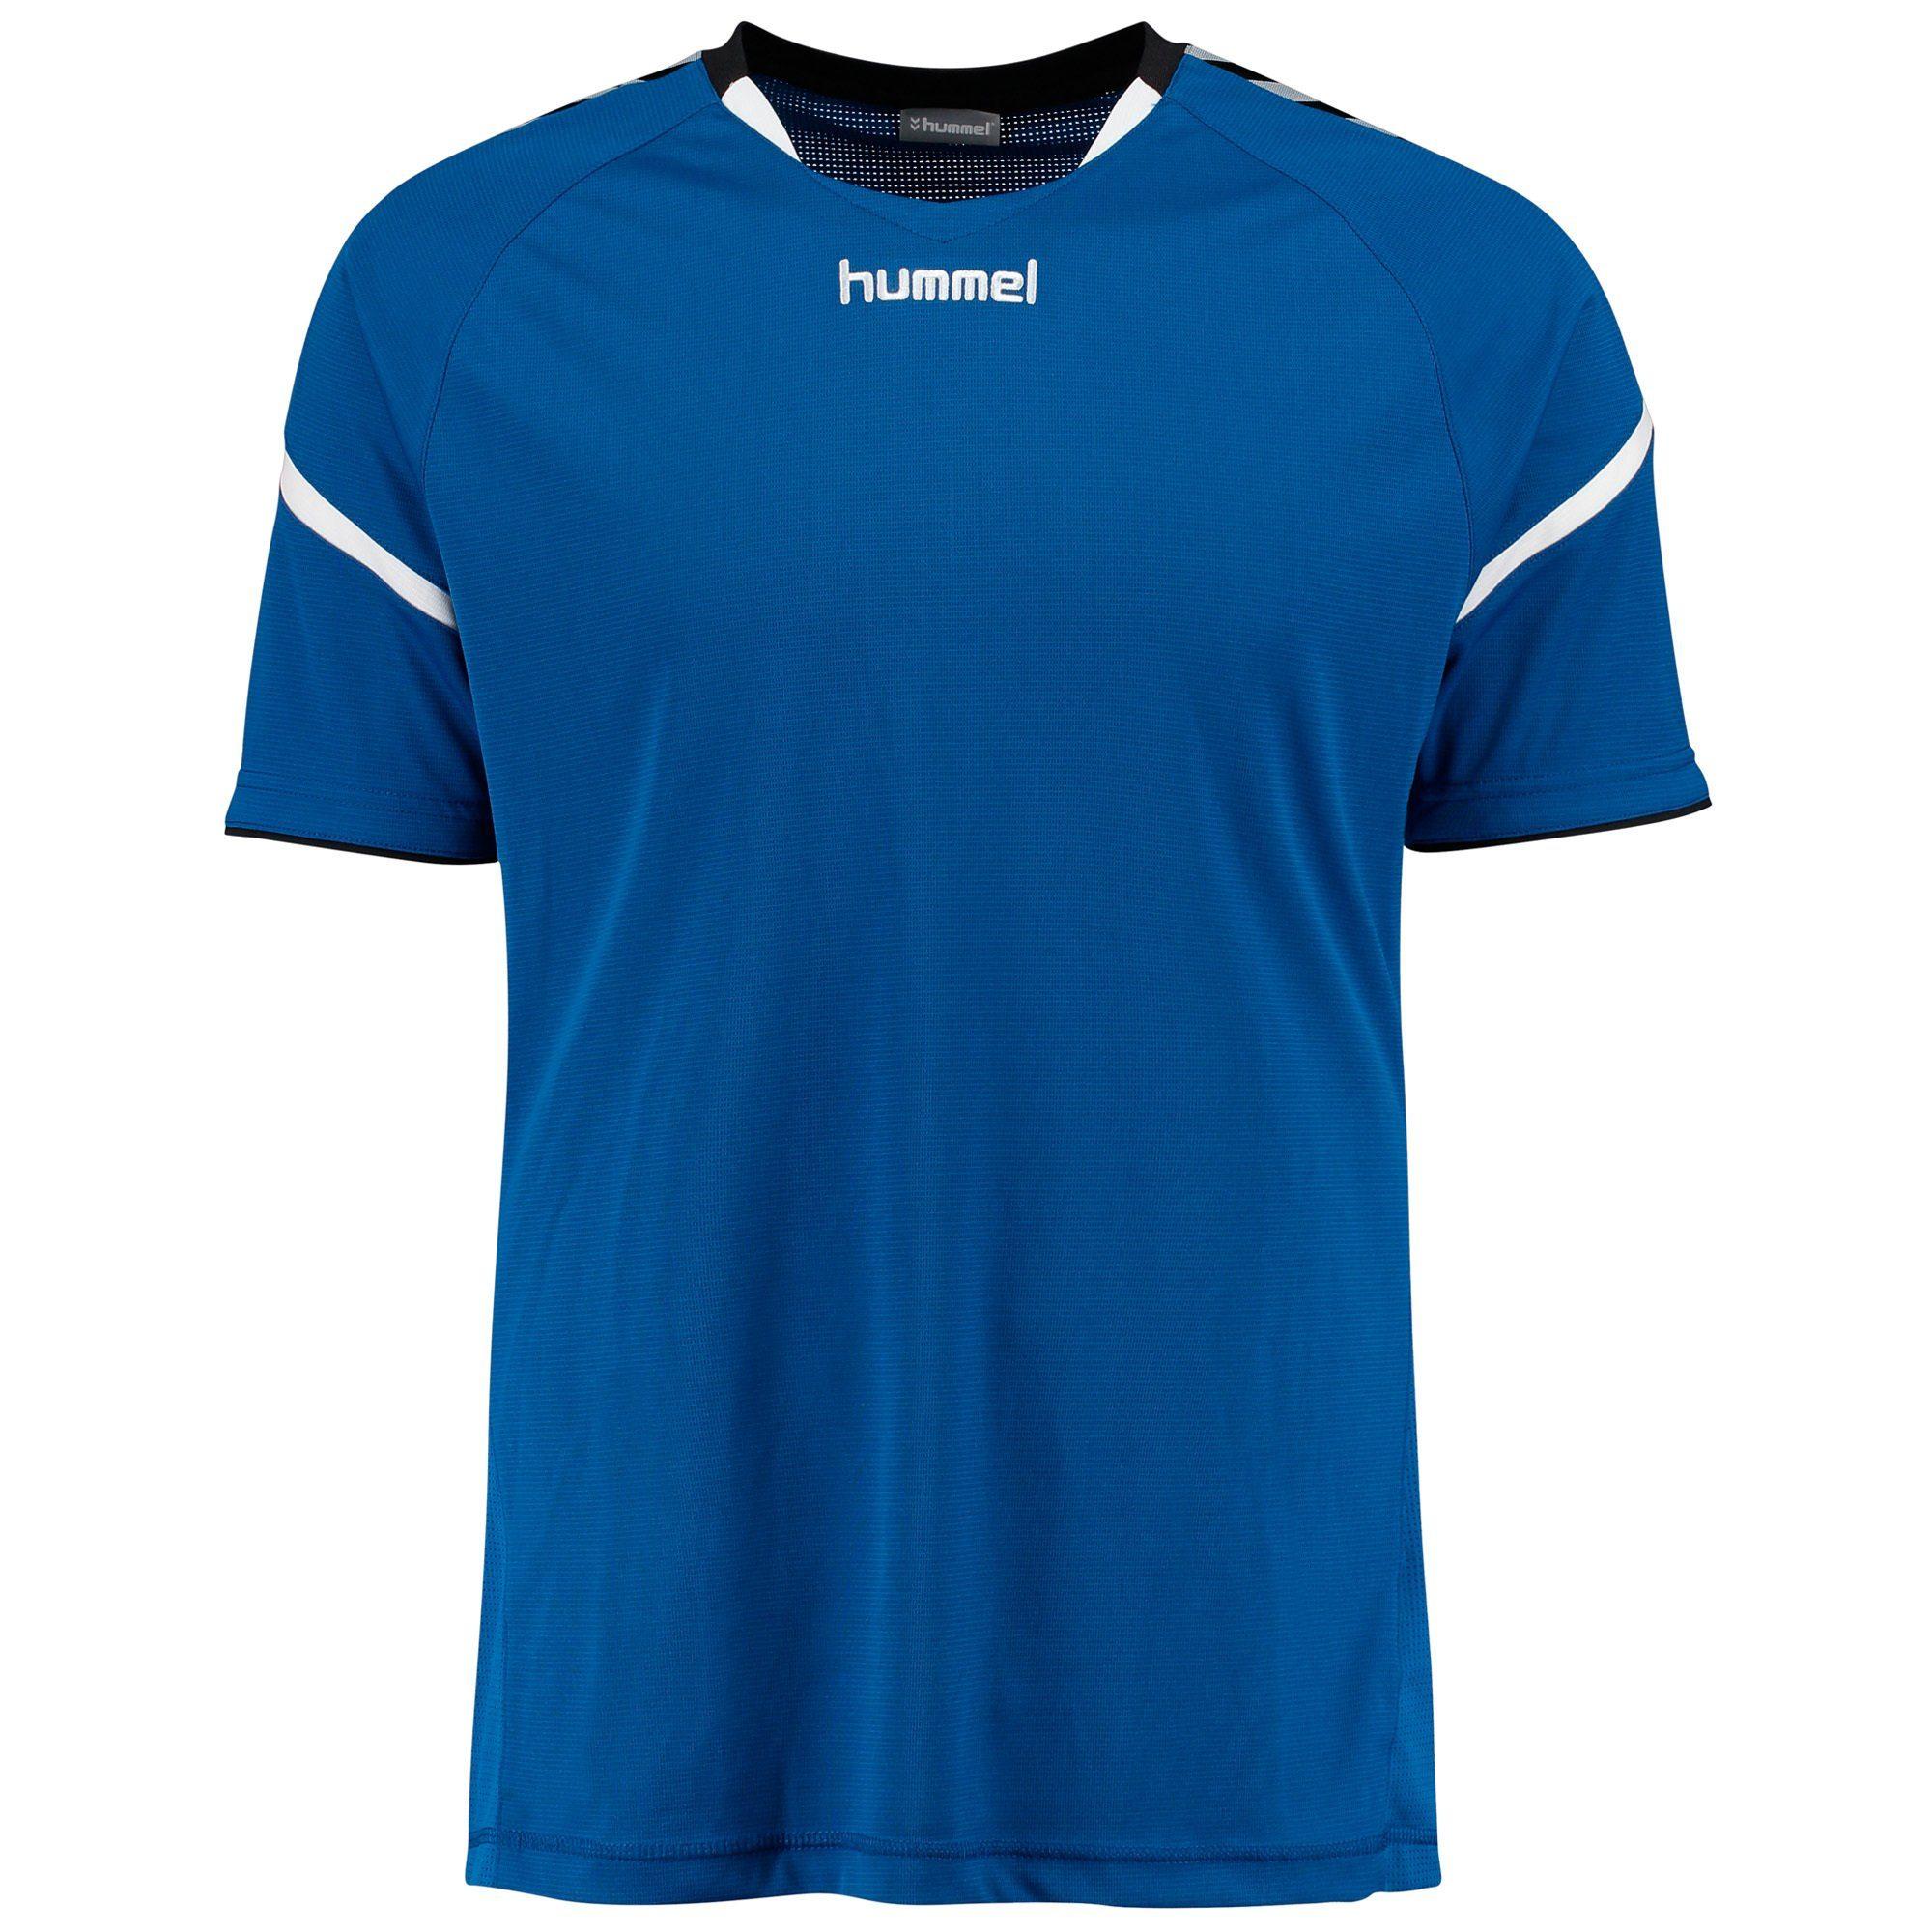 hummel Handballtrikot »Authentic Charge« | Sportbekleidung > Trikots > Handballtrikots | Blau | Jersey - Trikot | Hummel